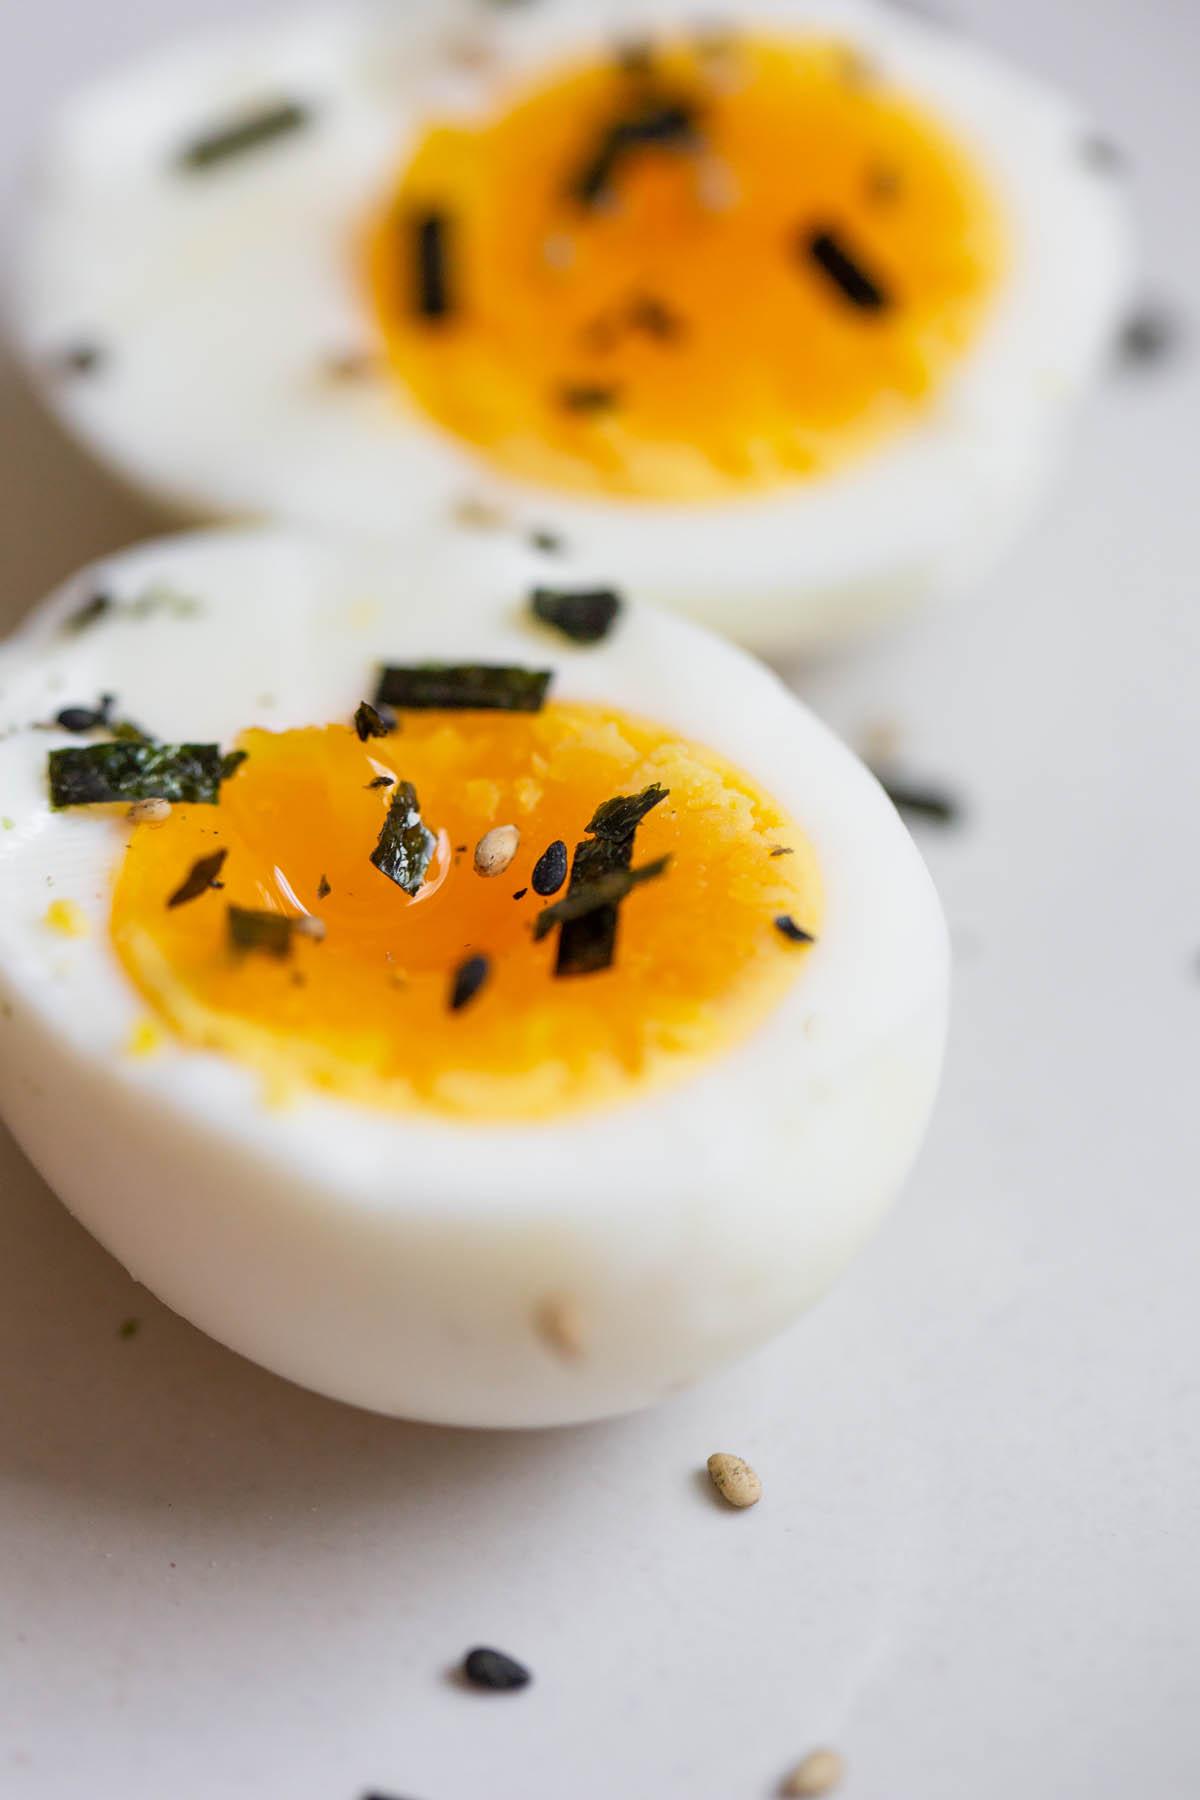 jammy eggs up close